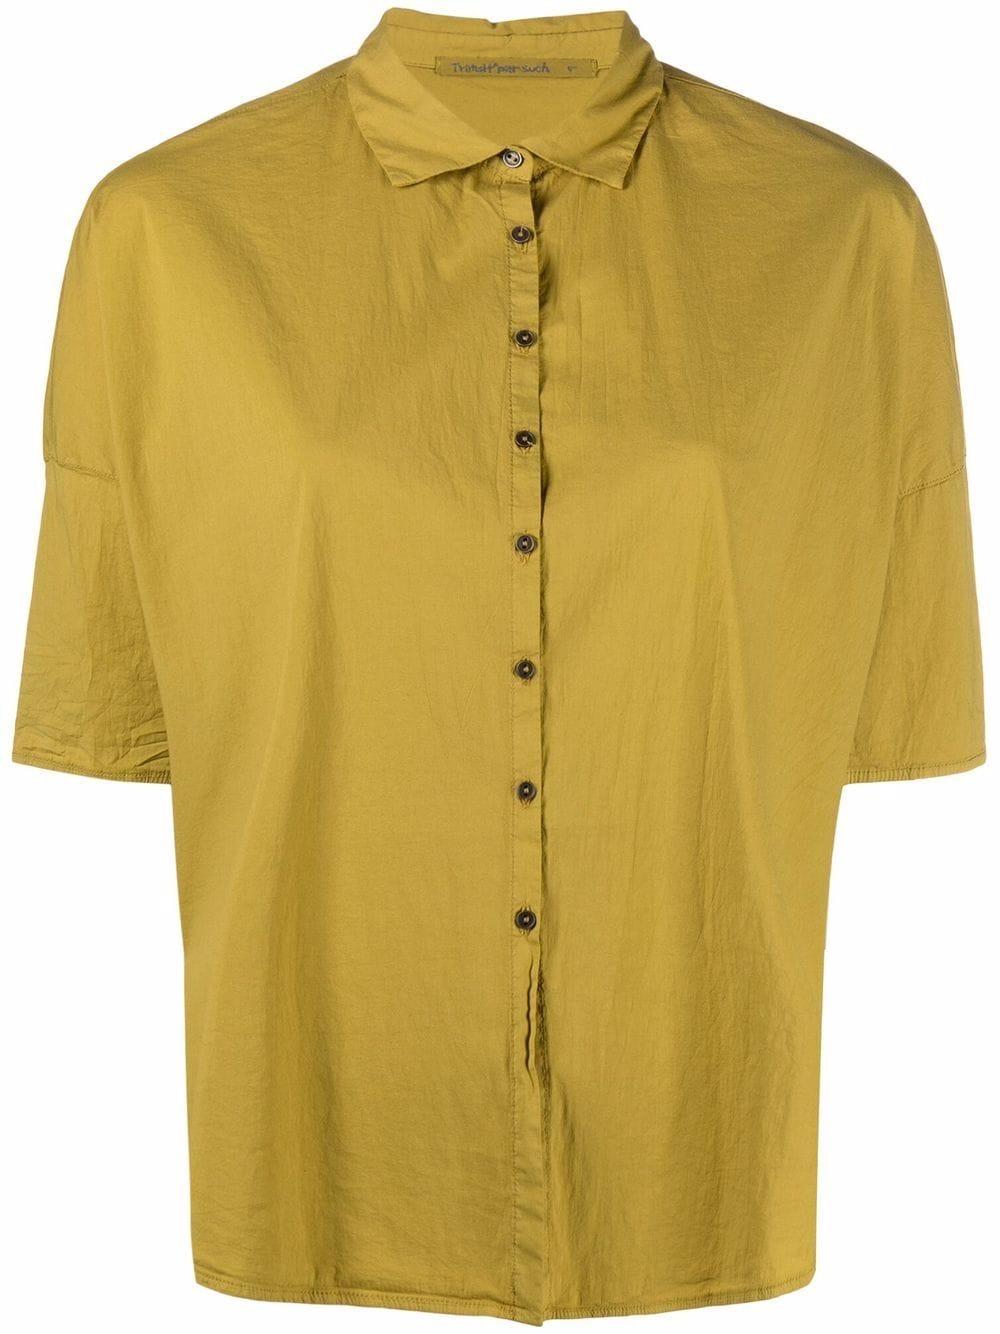 Snape yellow cotton curved-hem shirt  TRANSIT |  | CFDTRN-M22303